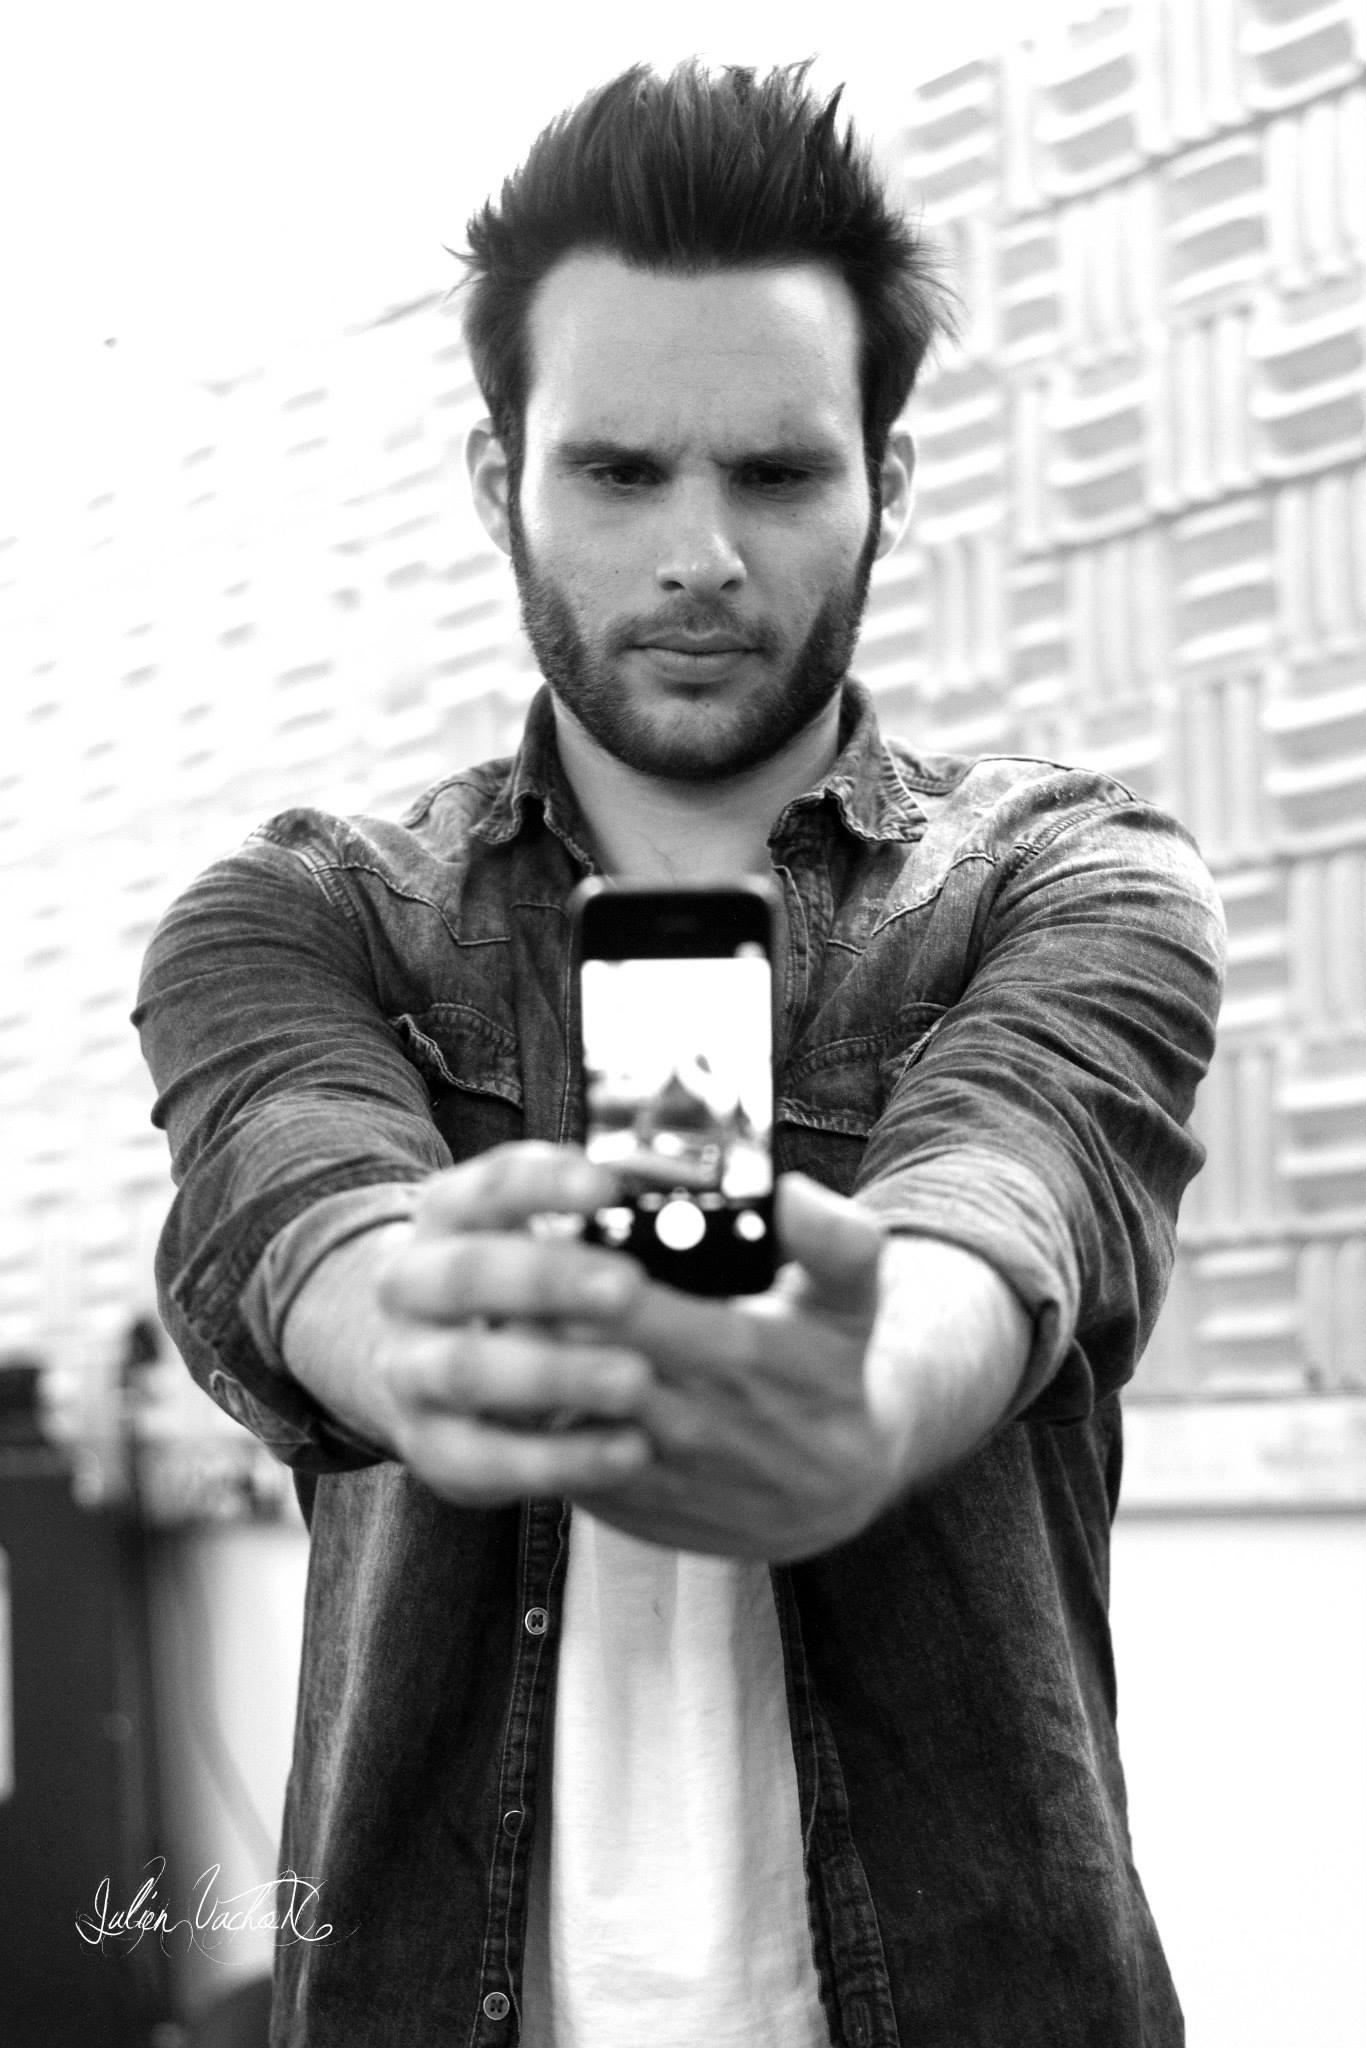 Santiago Casariego dit Santi – Music One / TF1